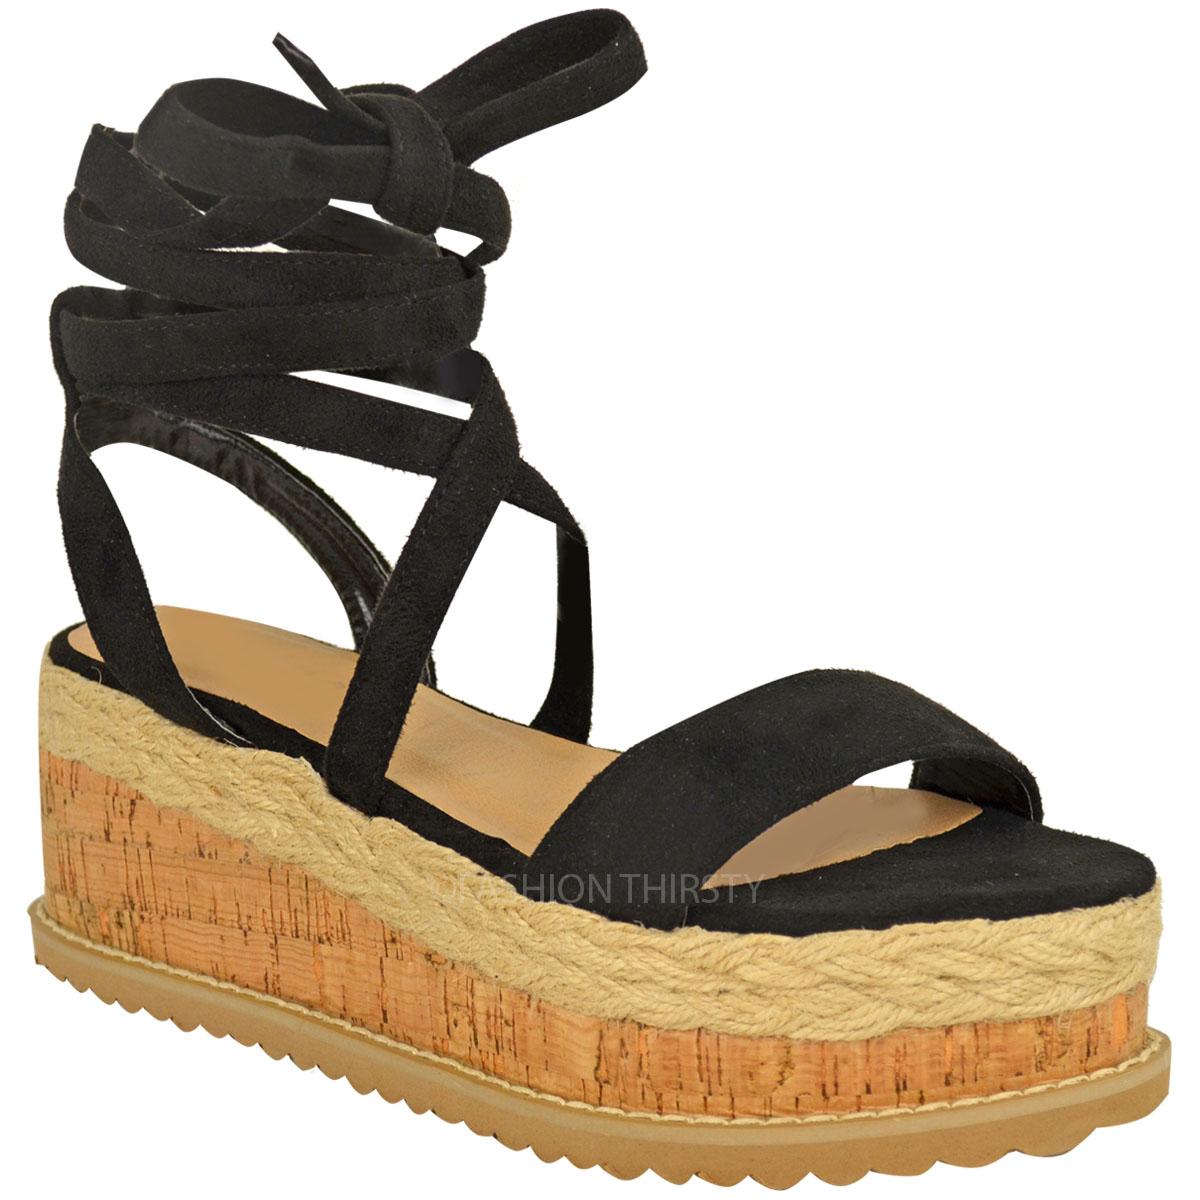 Flatform Ladies Espadrilles Shoes